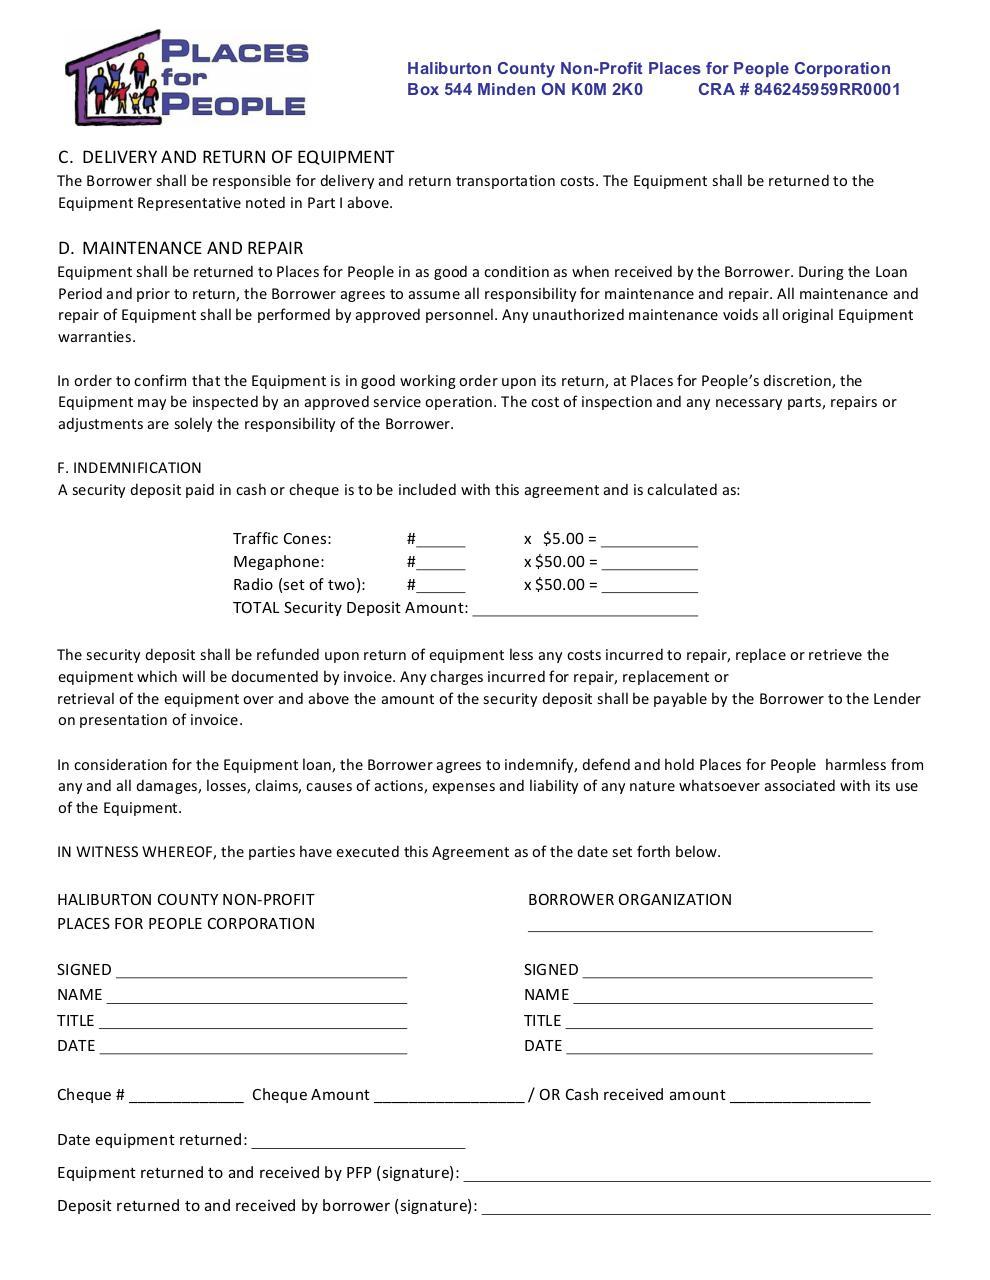 Short Term Loan Agreement Form rent eviction notice sample – Cash Loan Agreement